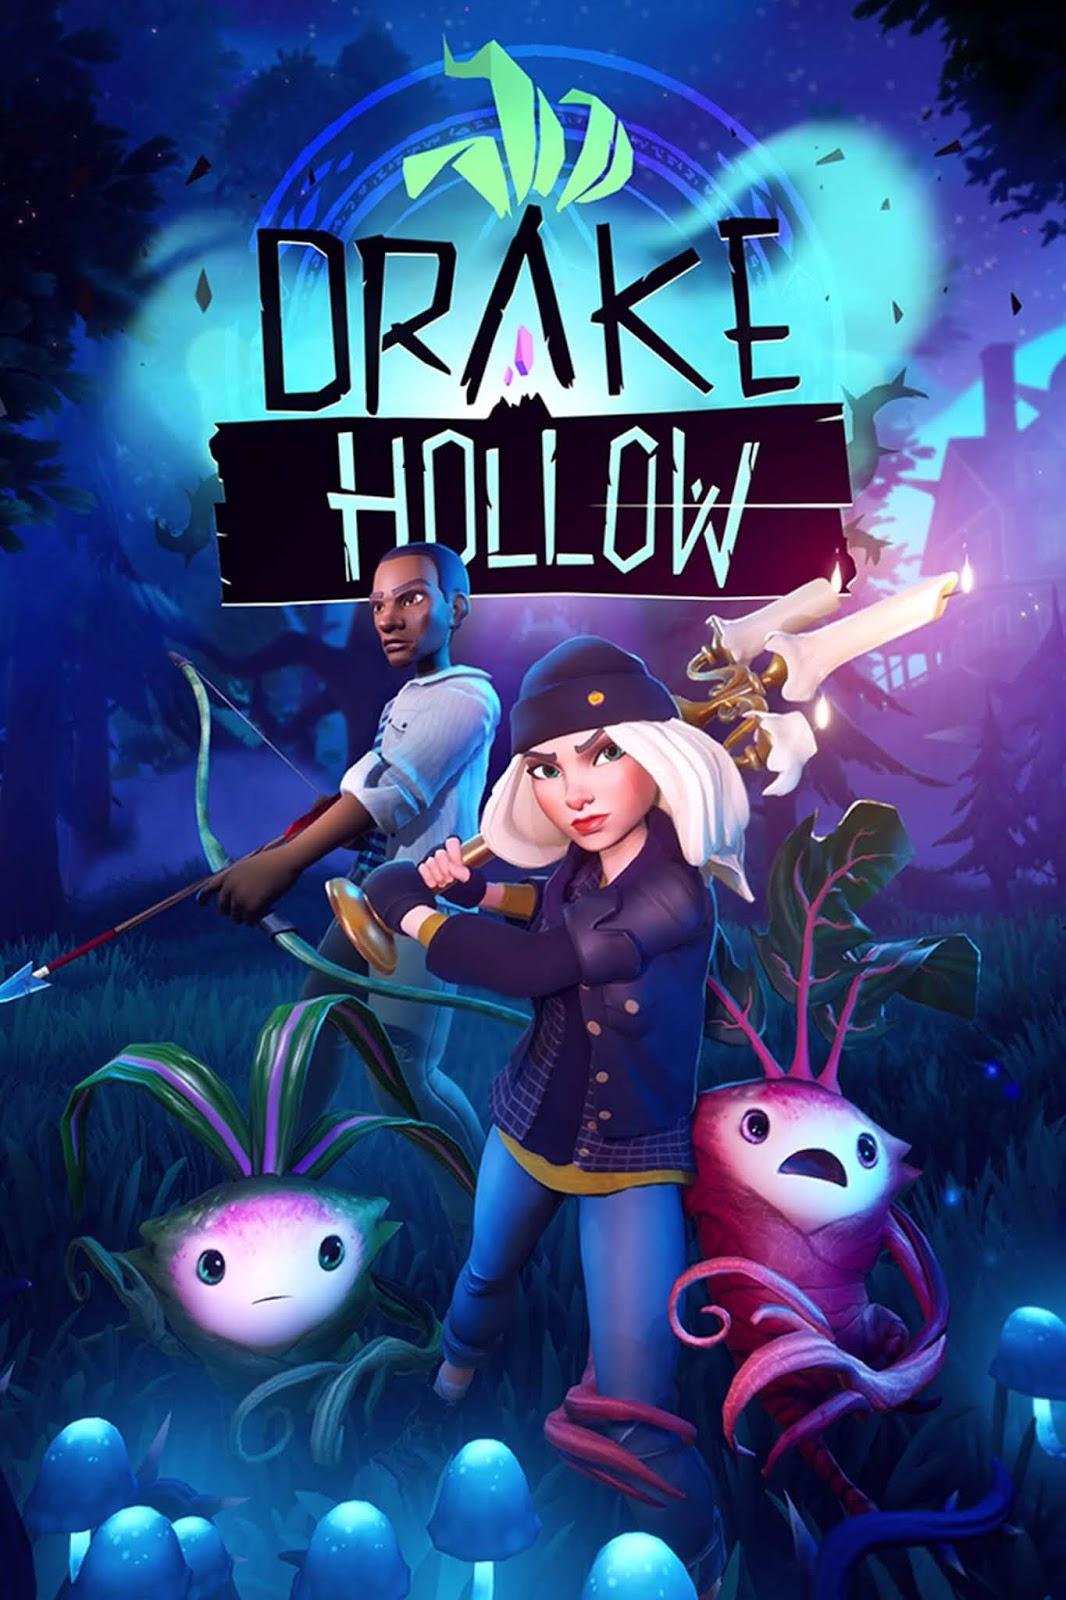 drake hollow,drake hollow gameplay,drake hollow pc,drake hollow ps4,drake hollow xbox,drake hollow review,drake hollow tips,drake hollow drakes,drake hollow guide,drake hollow xbox one,drake hollow episode 1,drake hollow walkthrough,drake hollow xbox game pass,drake hollow coop,drake hollow camp,drake hollow farming,drake hollow xbox one x,drake hollow survival,drake hollow schematics,drake hollow xbox series x,drake hollow multiplayer,drake hollow beta,drake hollow game,drake hallow